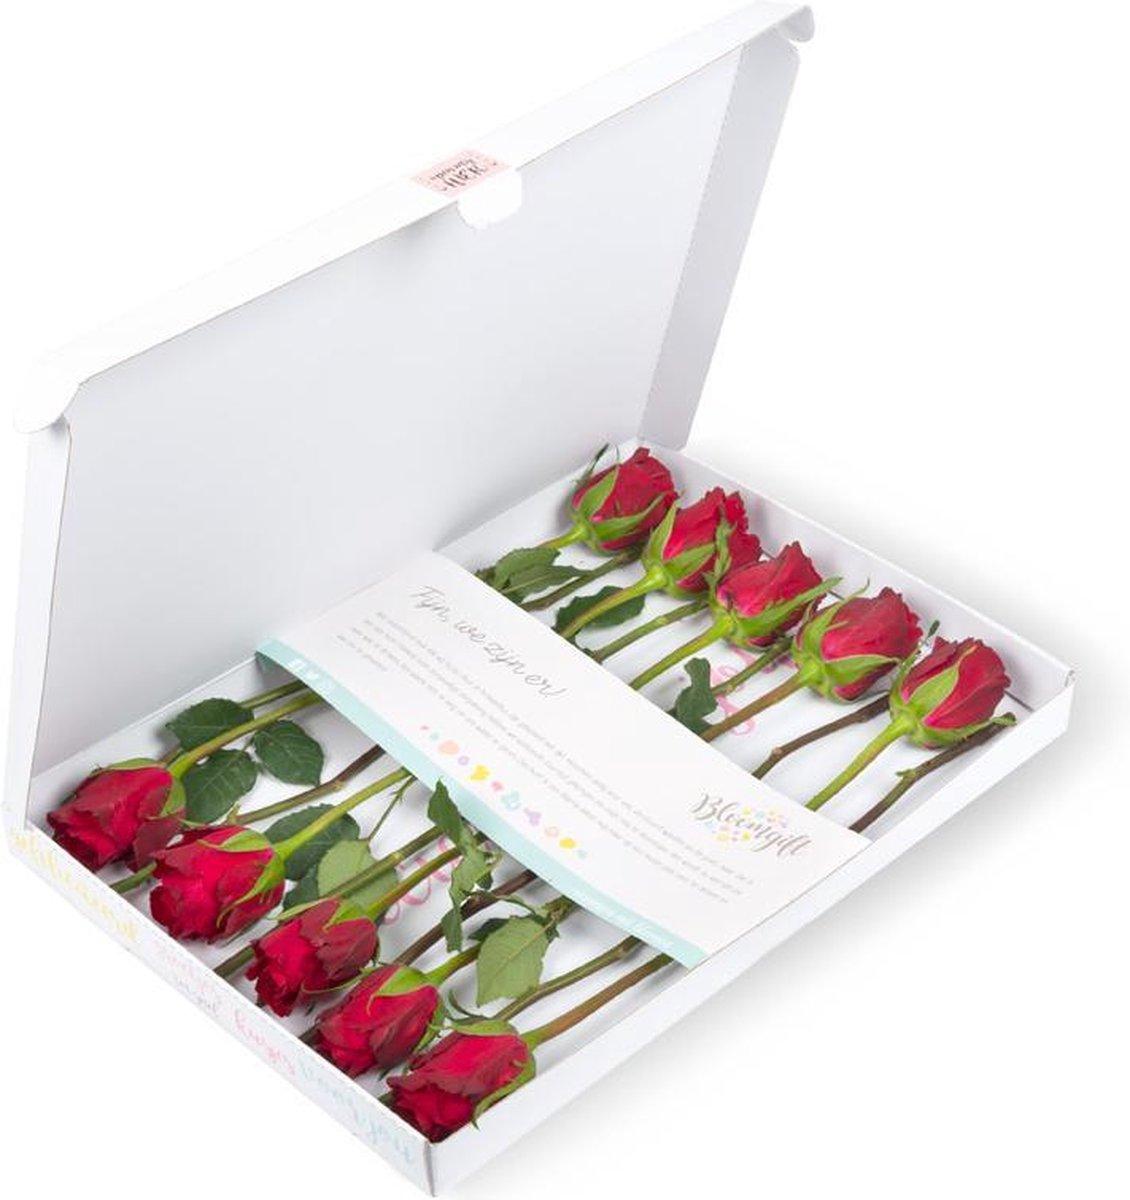 Brievenbusbloemen rode rozen